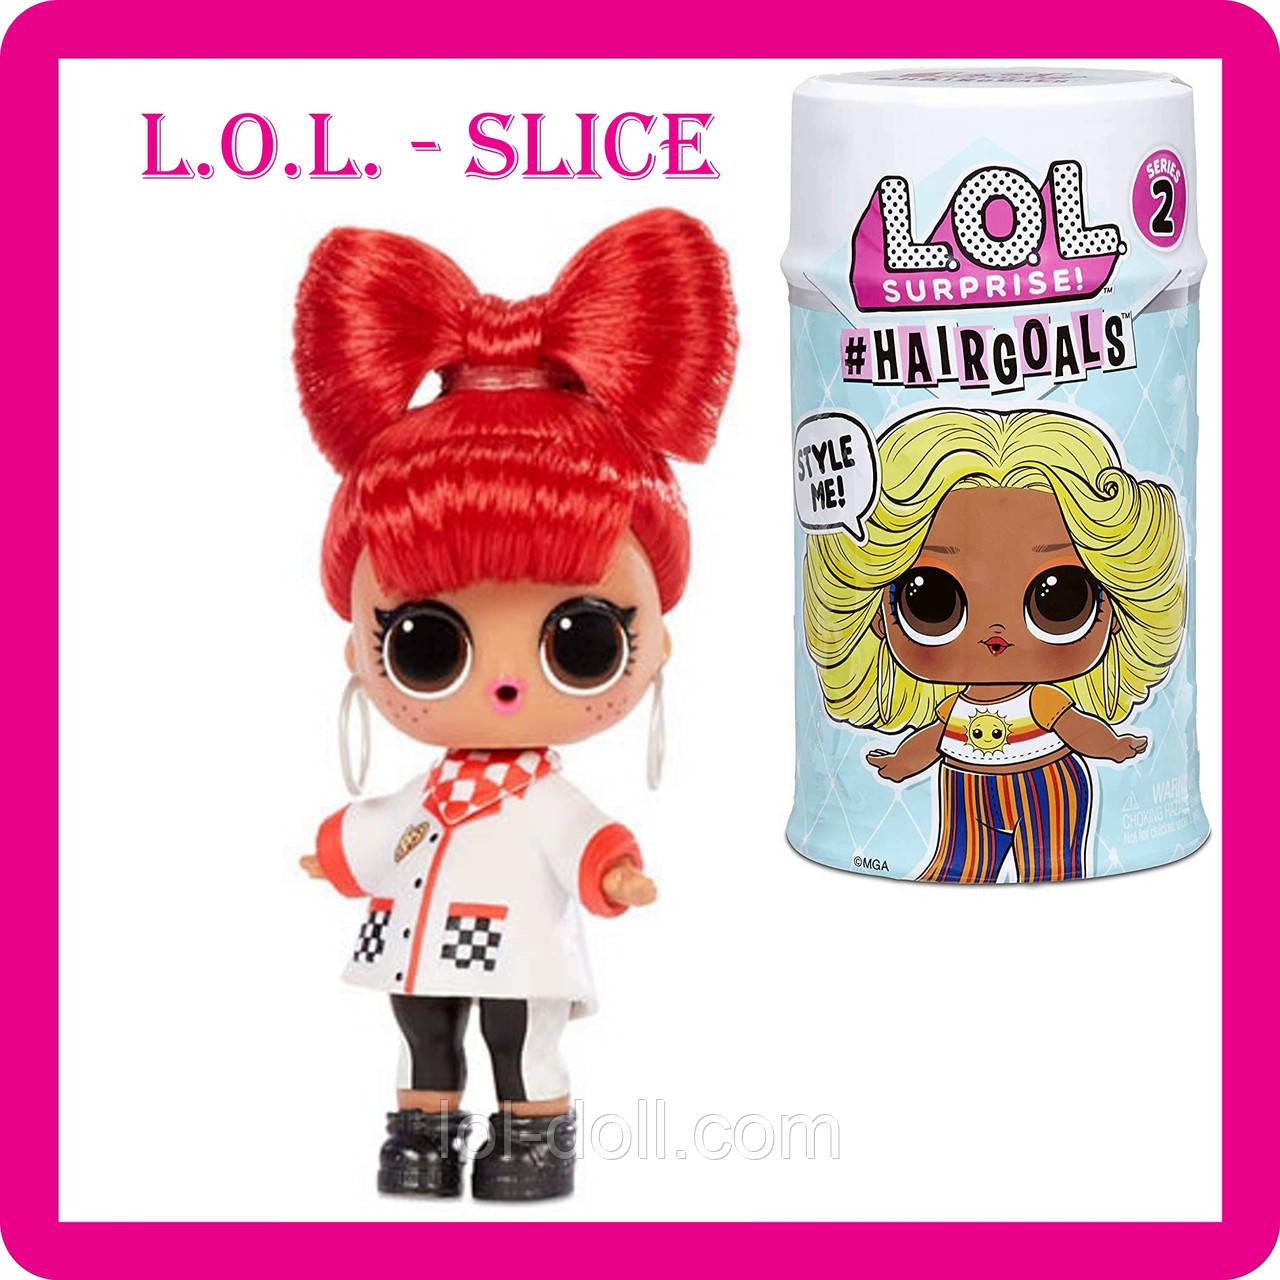 Кукла ЛОЛ Slice LOL Surprise Оригинал Hairgoals 2 серия Хеиргоалс